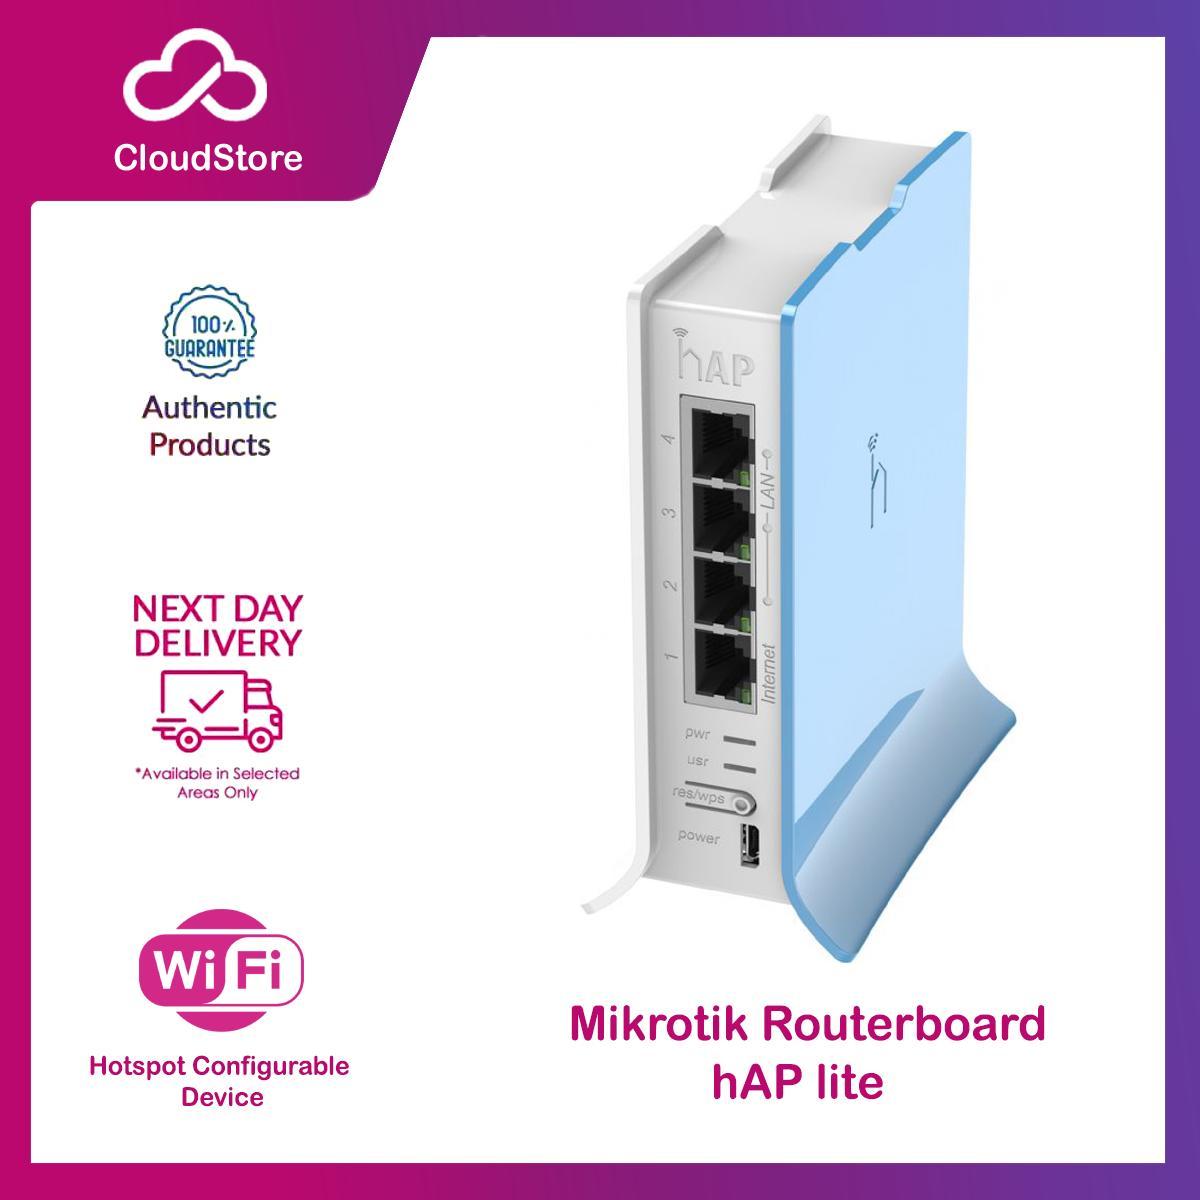 Mikrotik RB941-2nD-TC hAP Lite SOHO Router haplite bandwidth manager AP